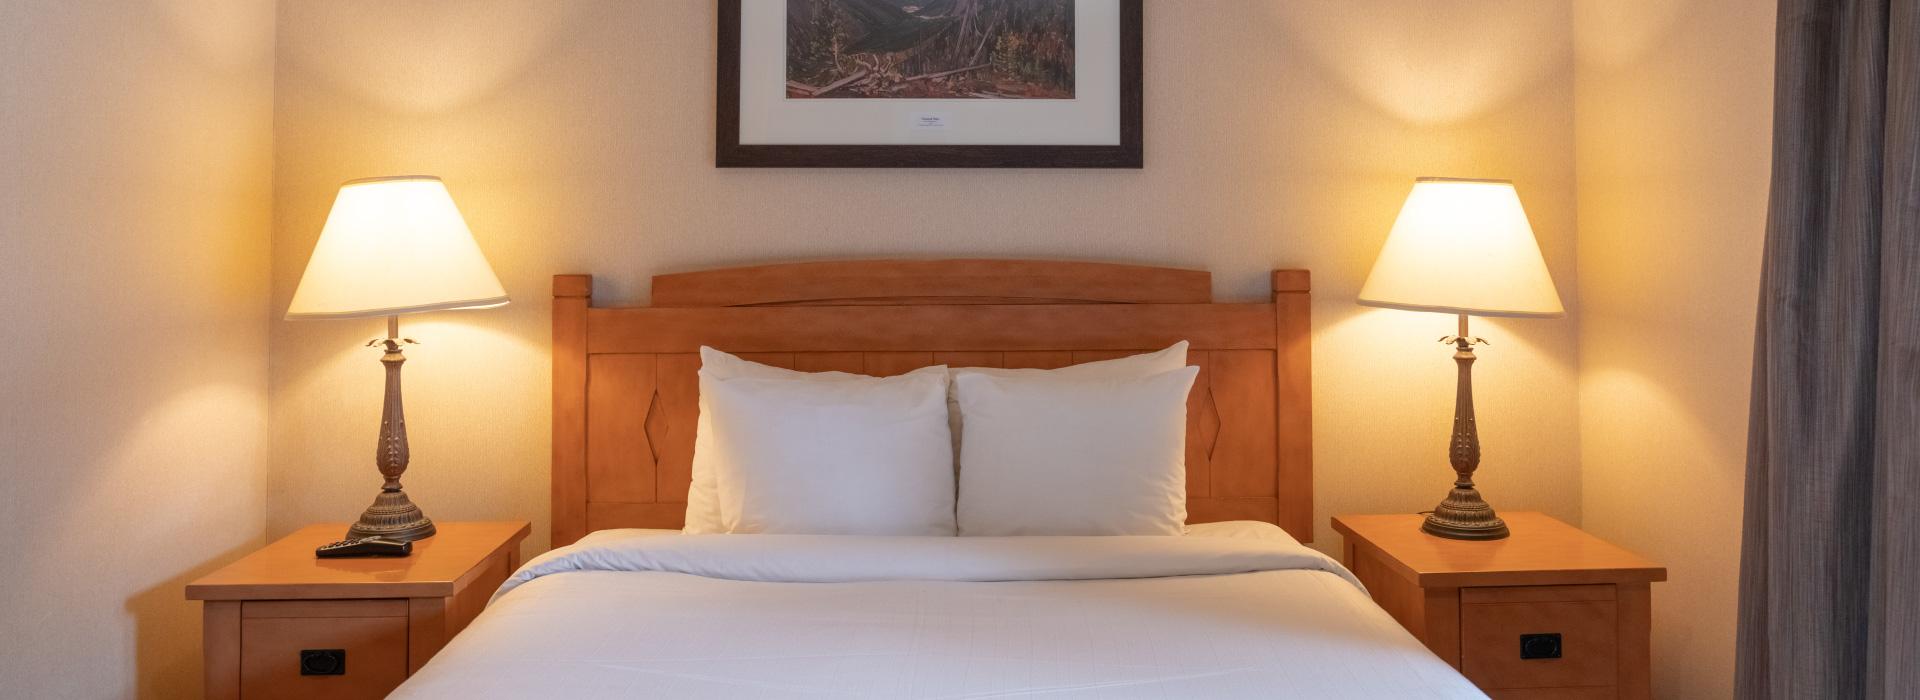 Premier Two Bedroom Loft Condo-3Q